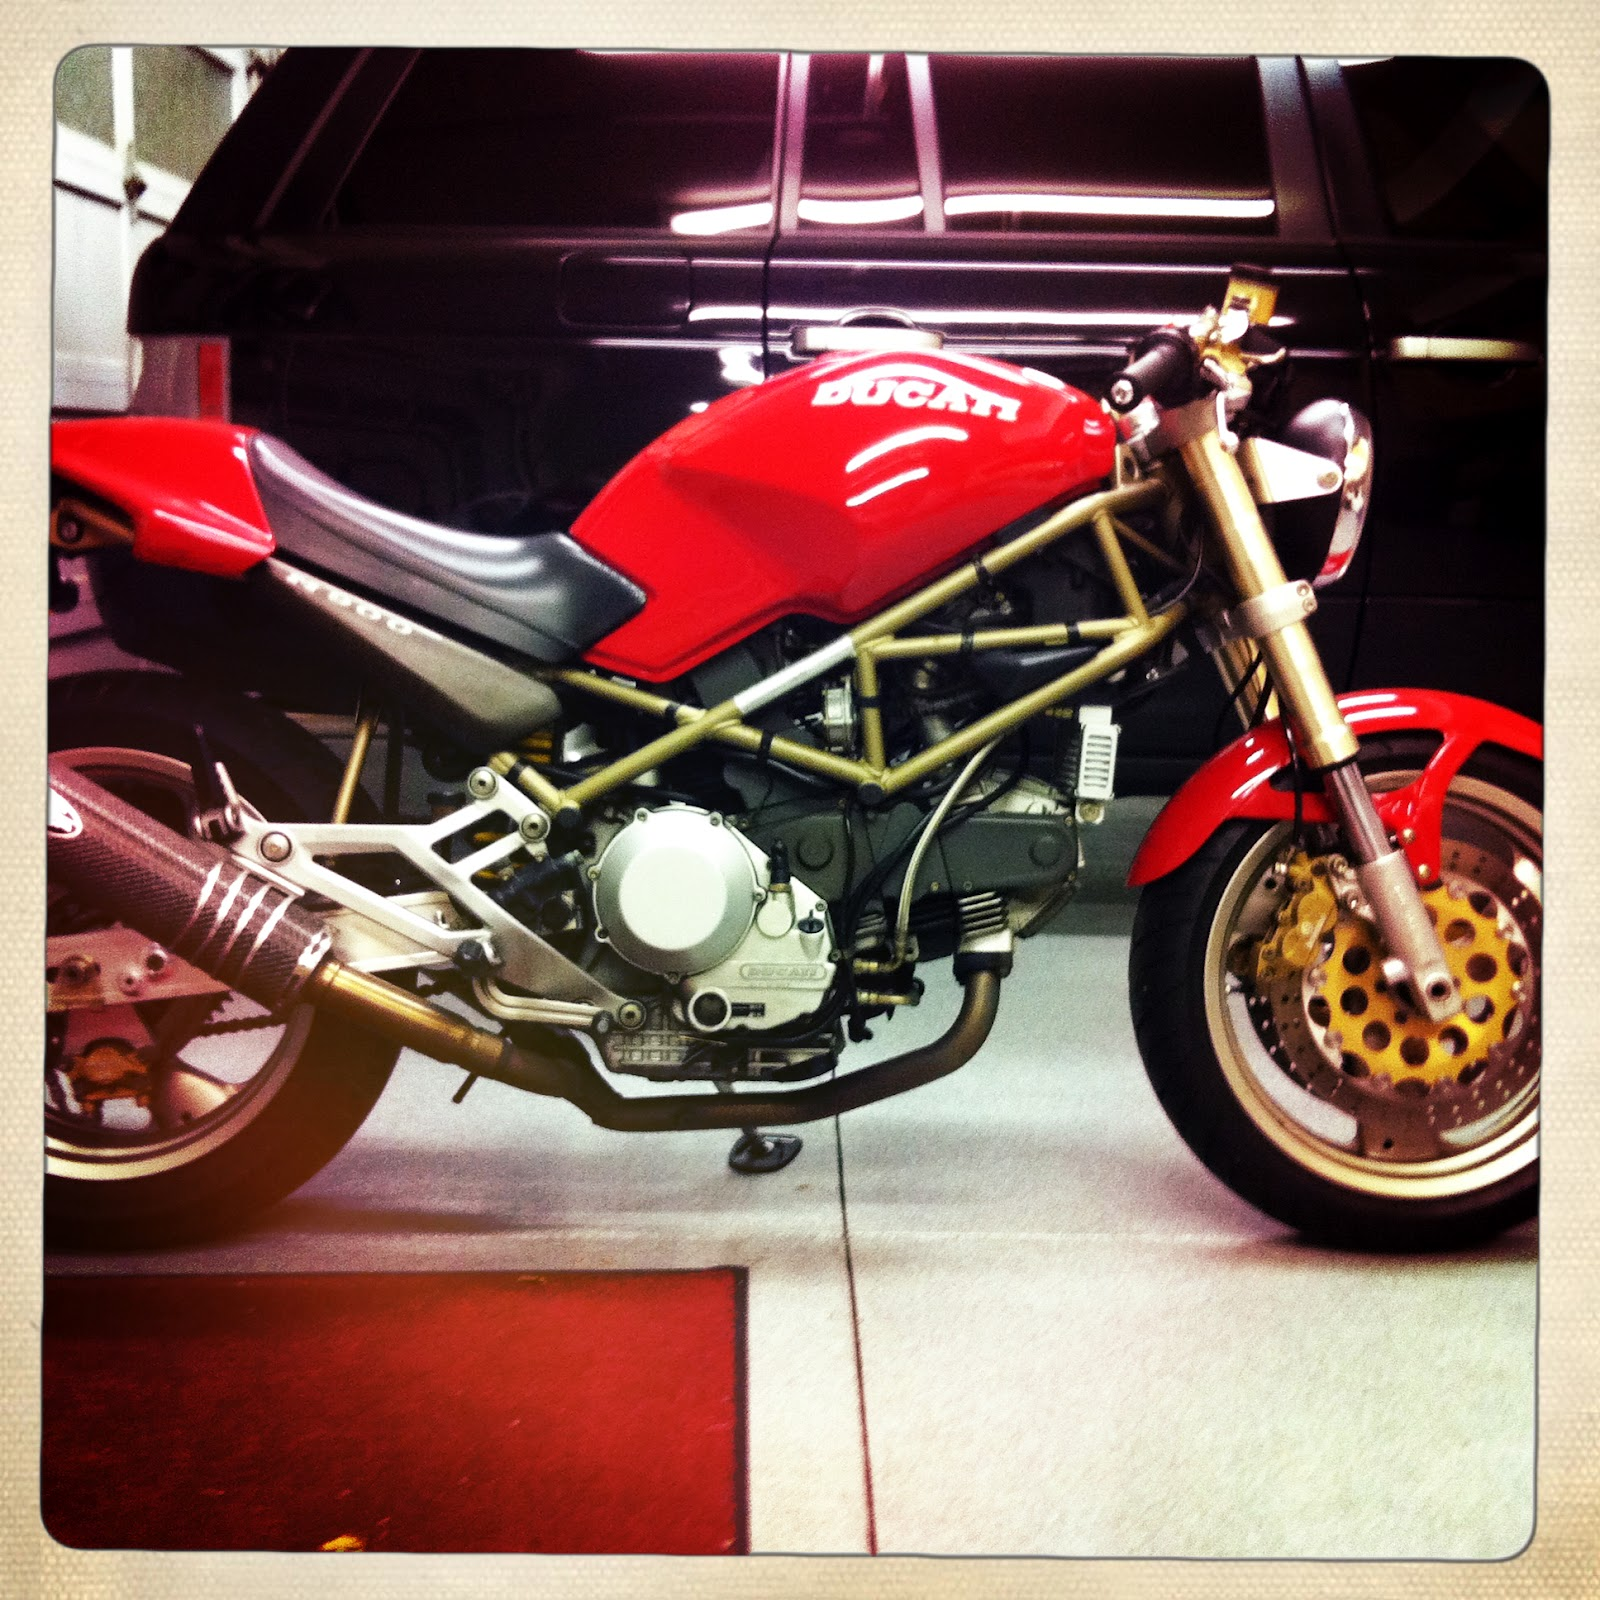 The Ducati Monster 900 Build